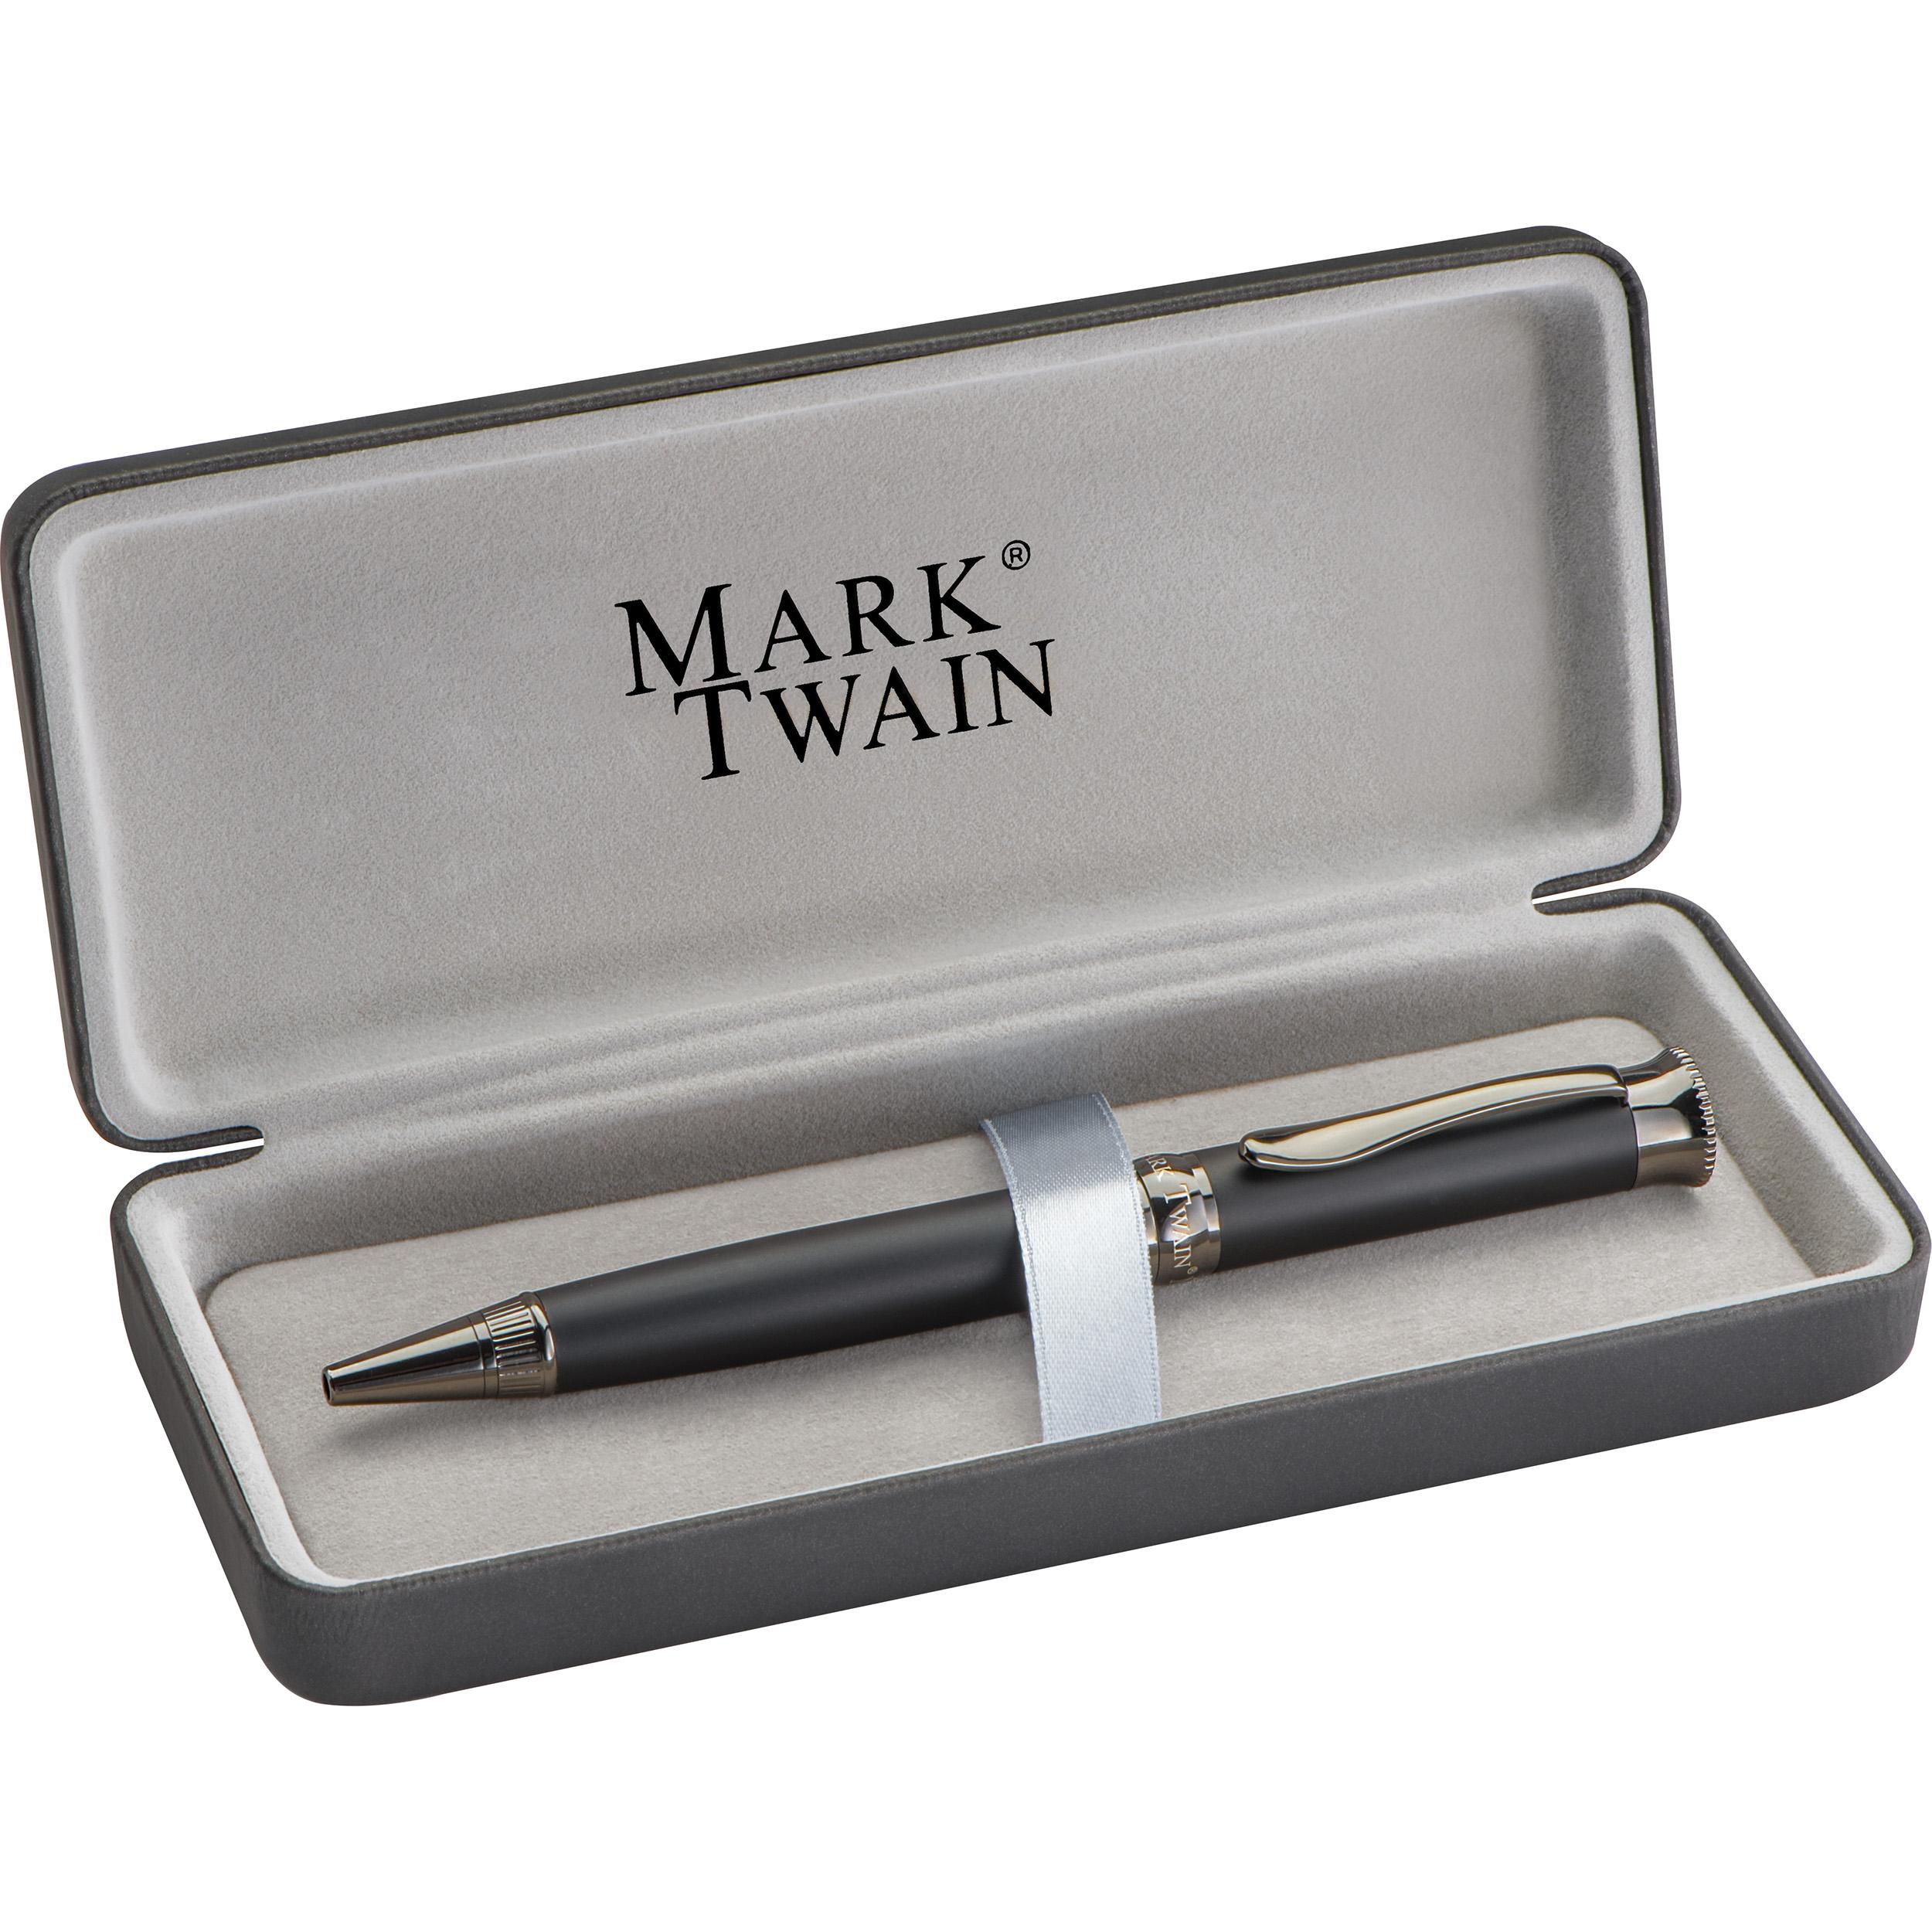 Mark Twain ballpen